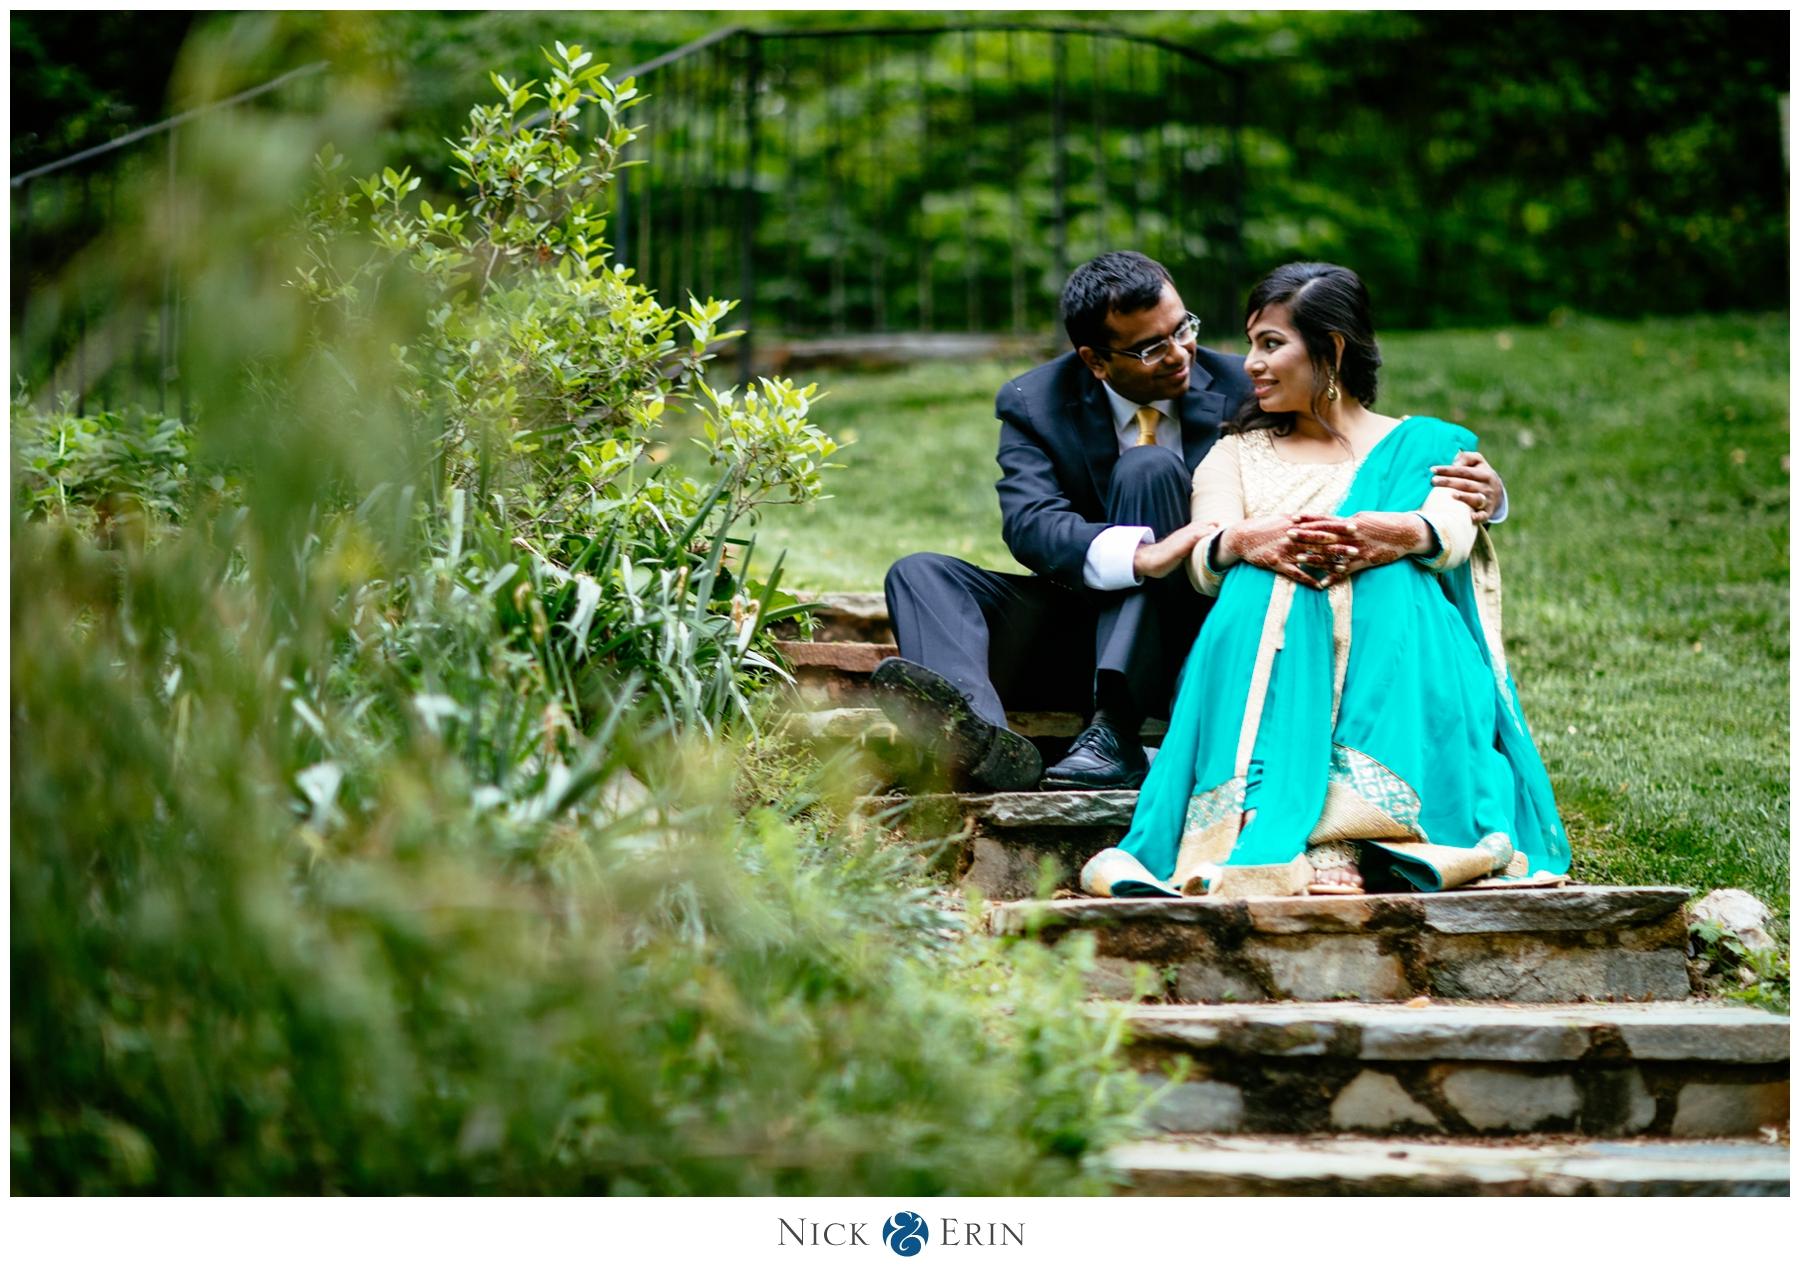 Donner_Photography_Arlington VA Wedding_Amrith and Aleefia_0005